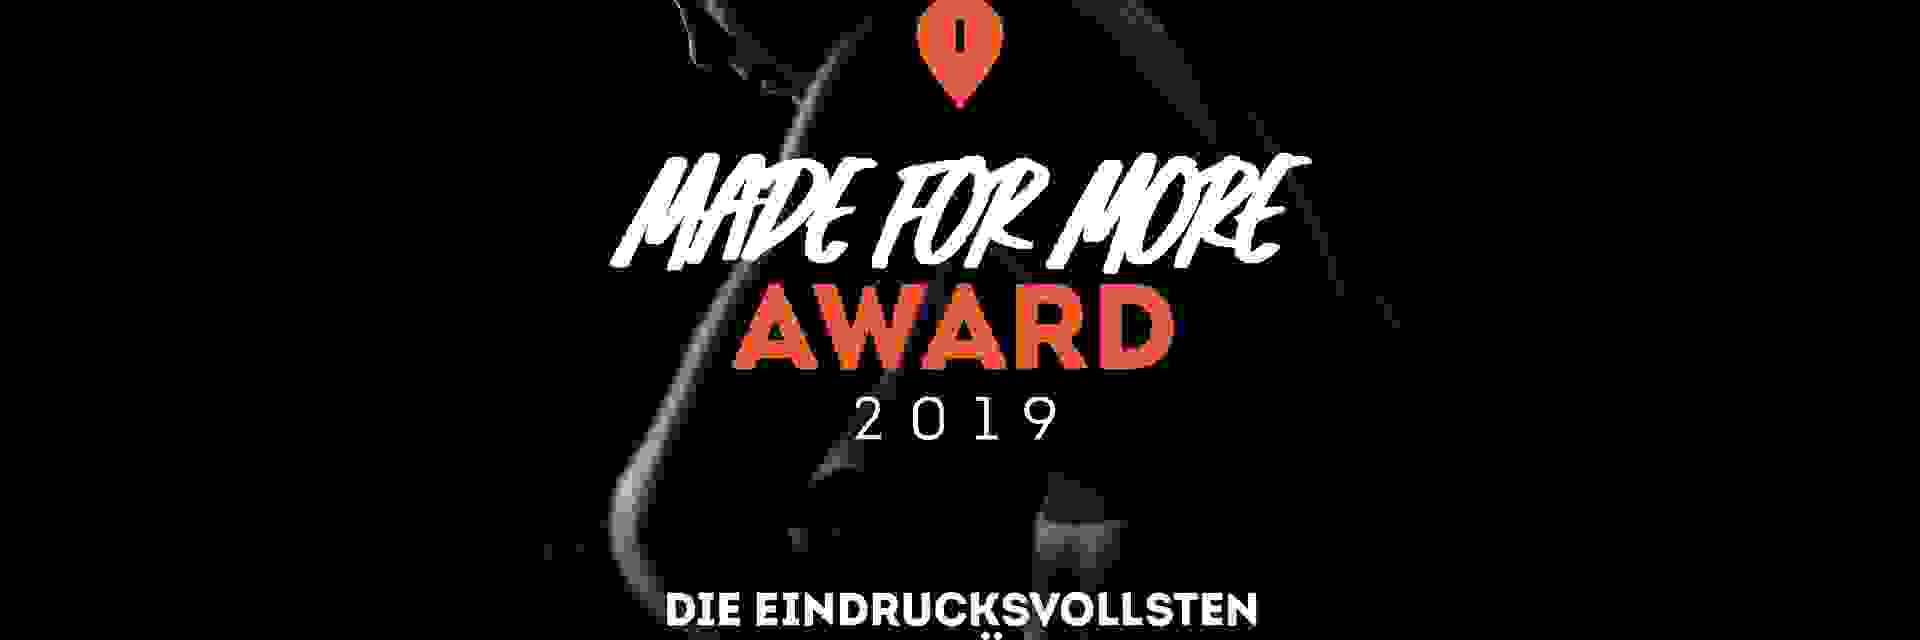 Made for More Award